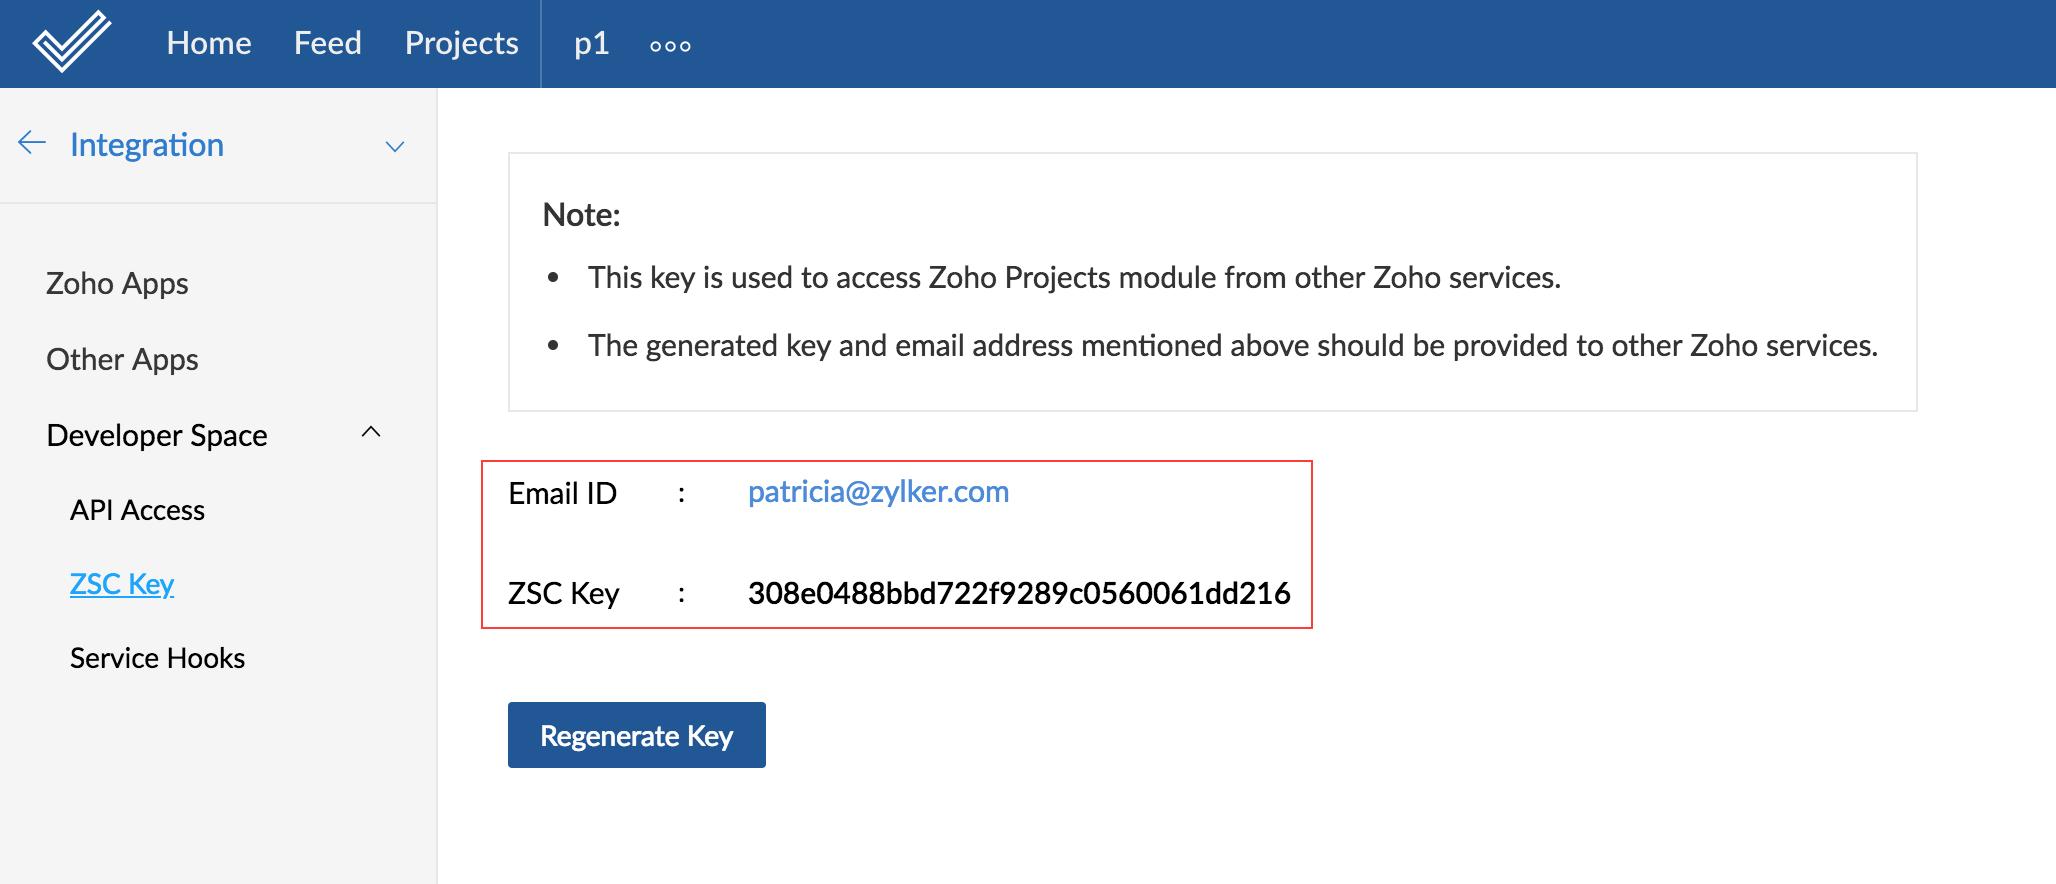 Zoho Projects ZSC Key